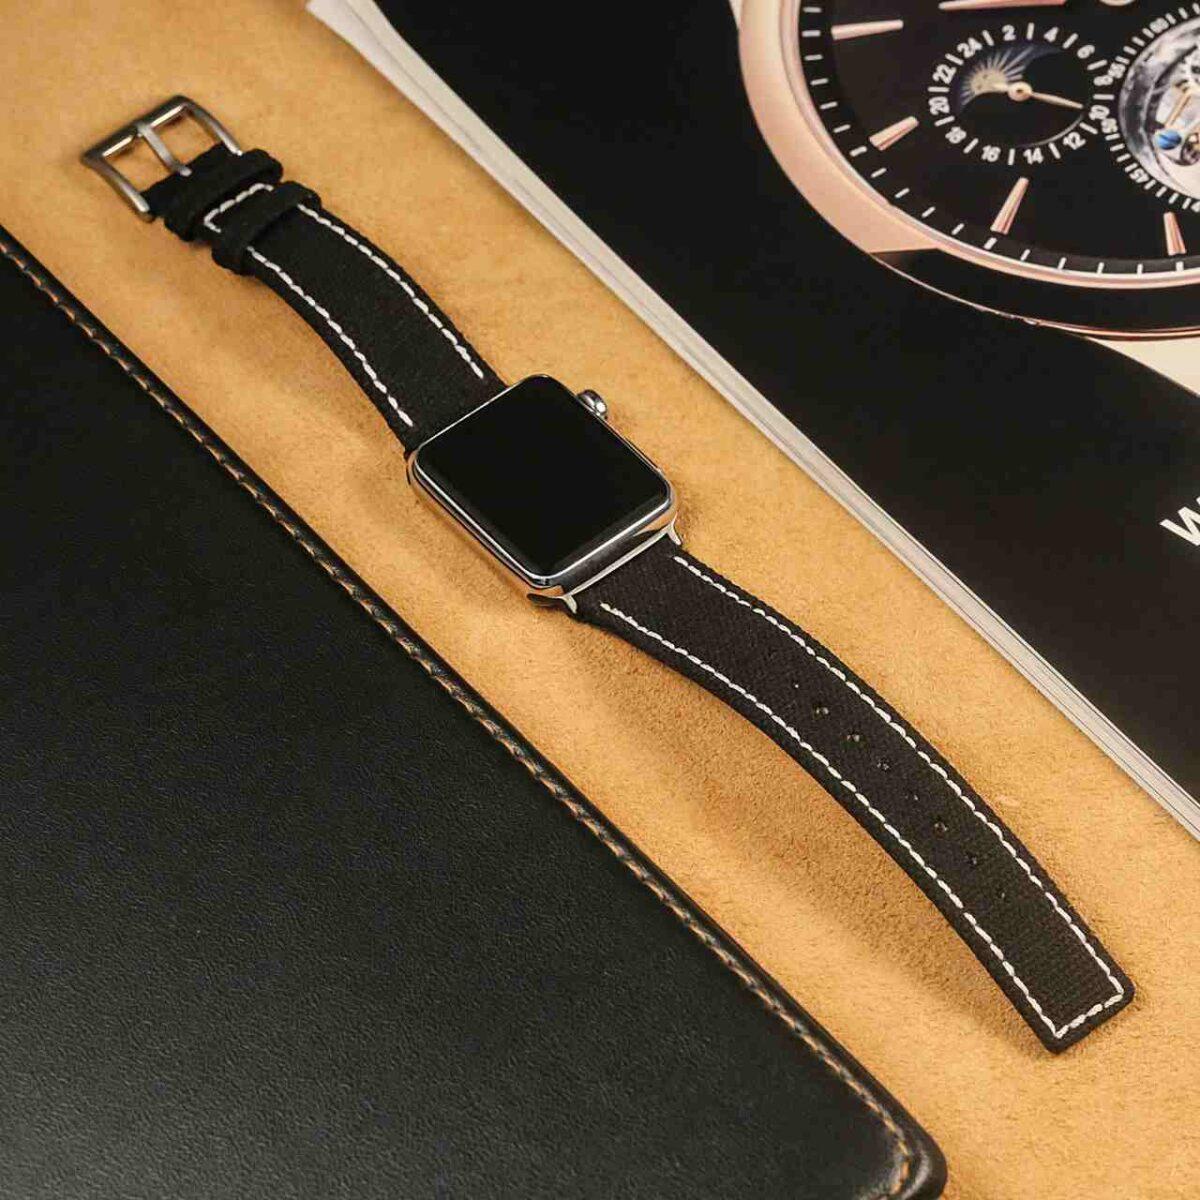 Apple Watch Bands   Black Weaved Canvas White Stitches   Hemsut